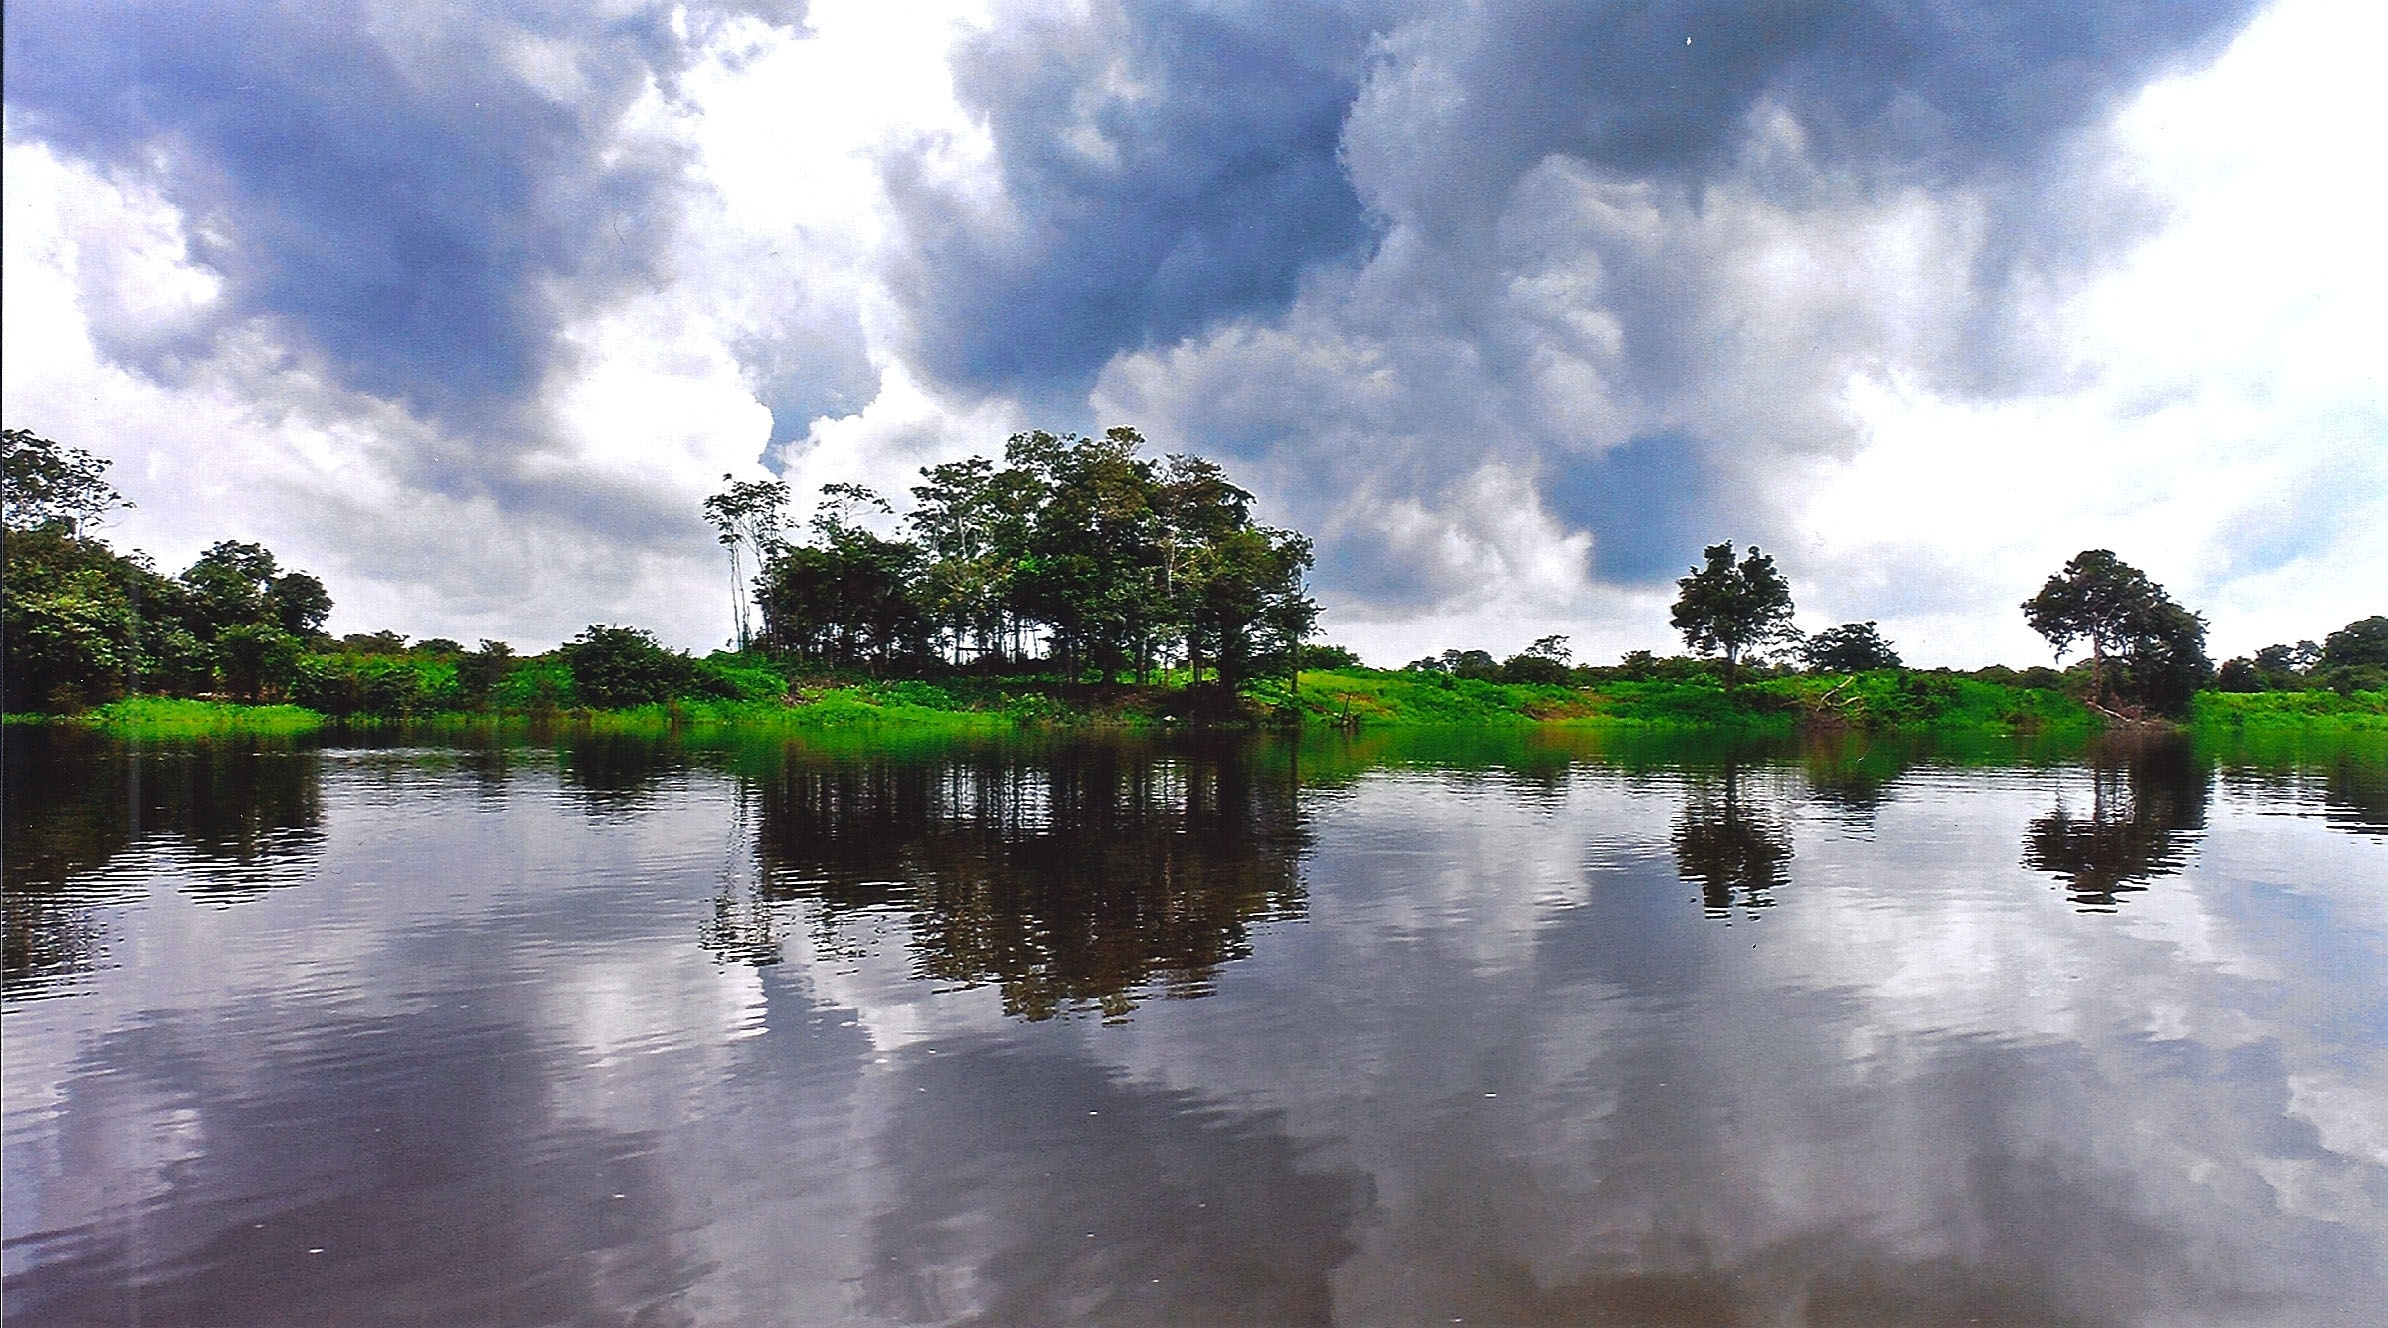 Manaus: Adventurers' Gateway To The Amazon   The Japan Times